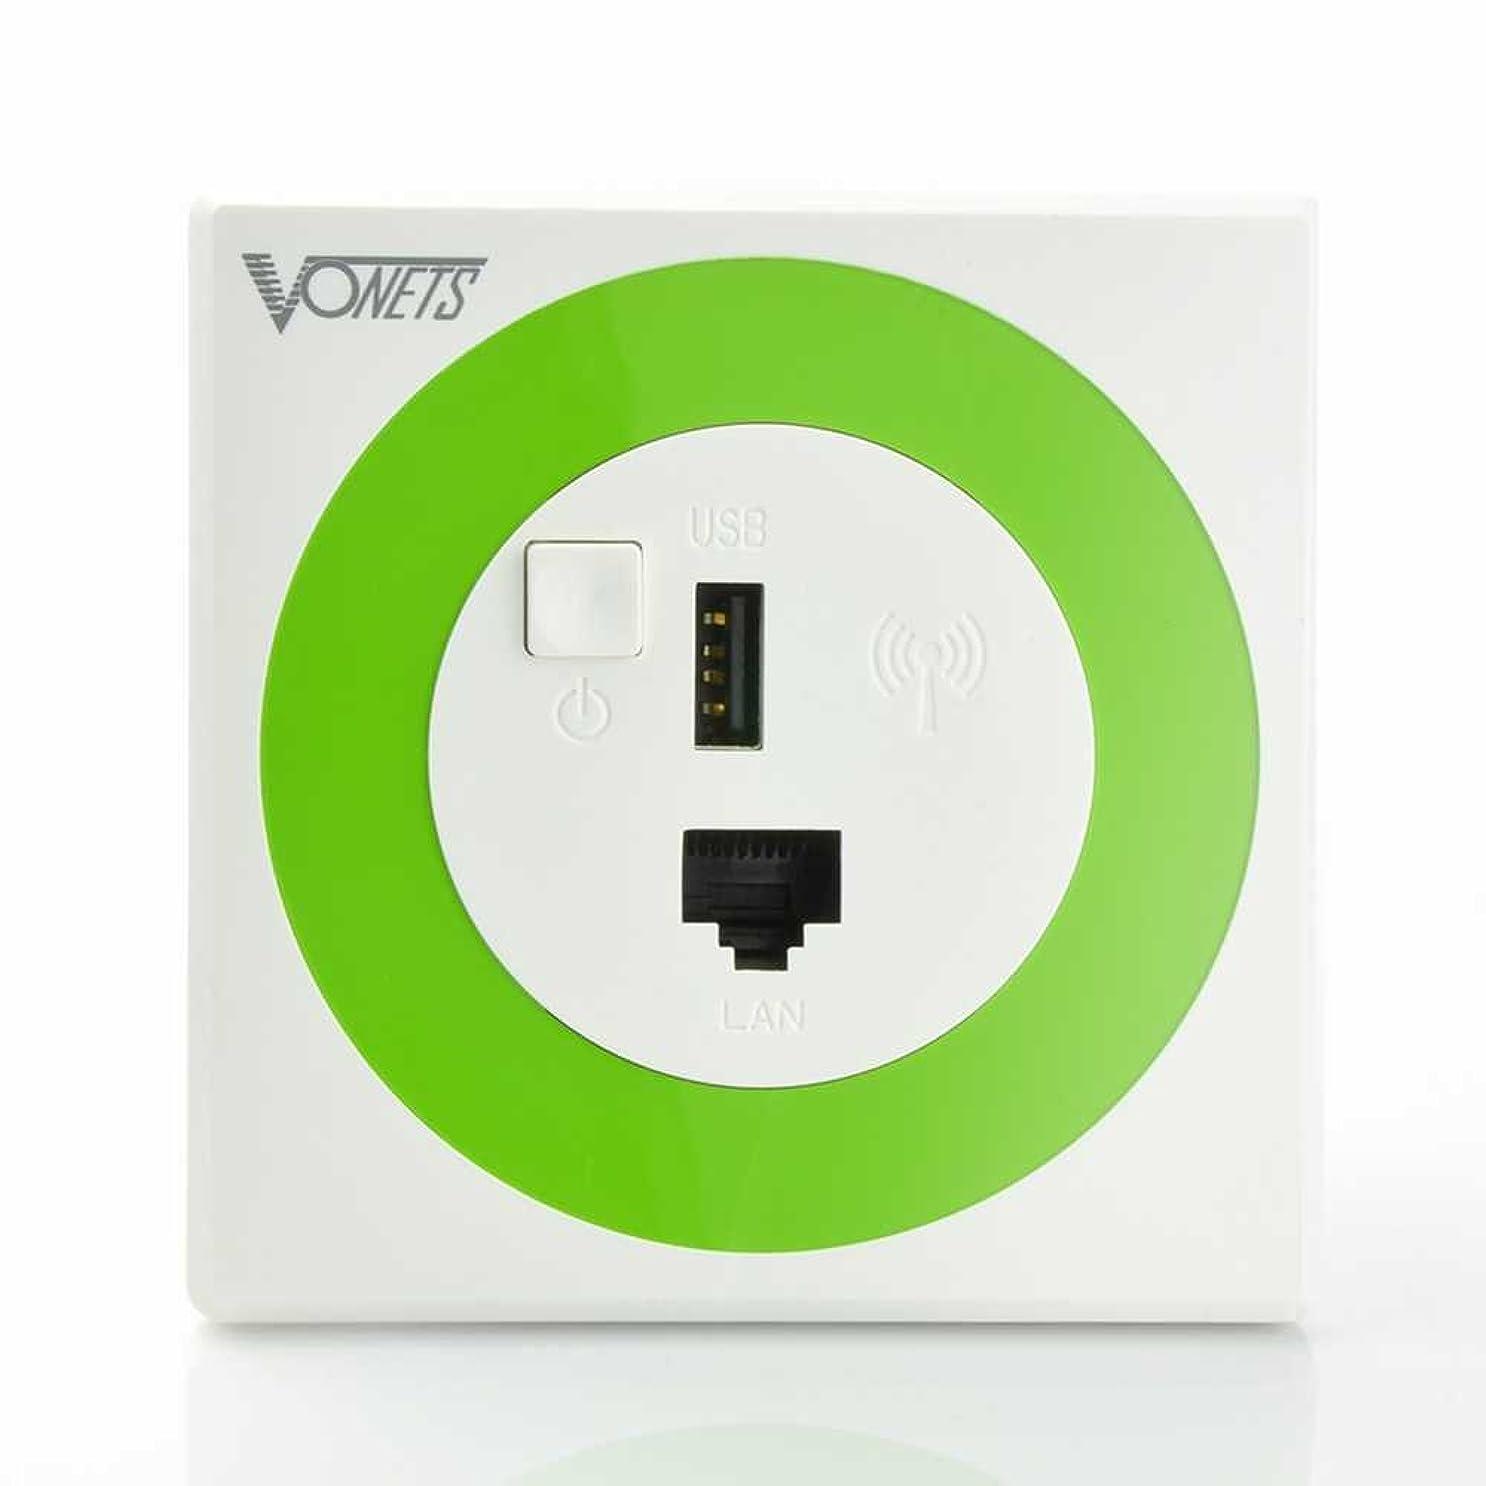 YOUKUKE 無線LANルーター/USB充電器付きワイヤレスAPルーター屋内壁埋め込み無線LANリピーターインターネットルーター